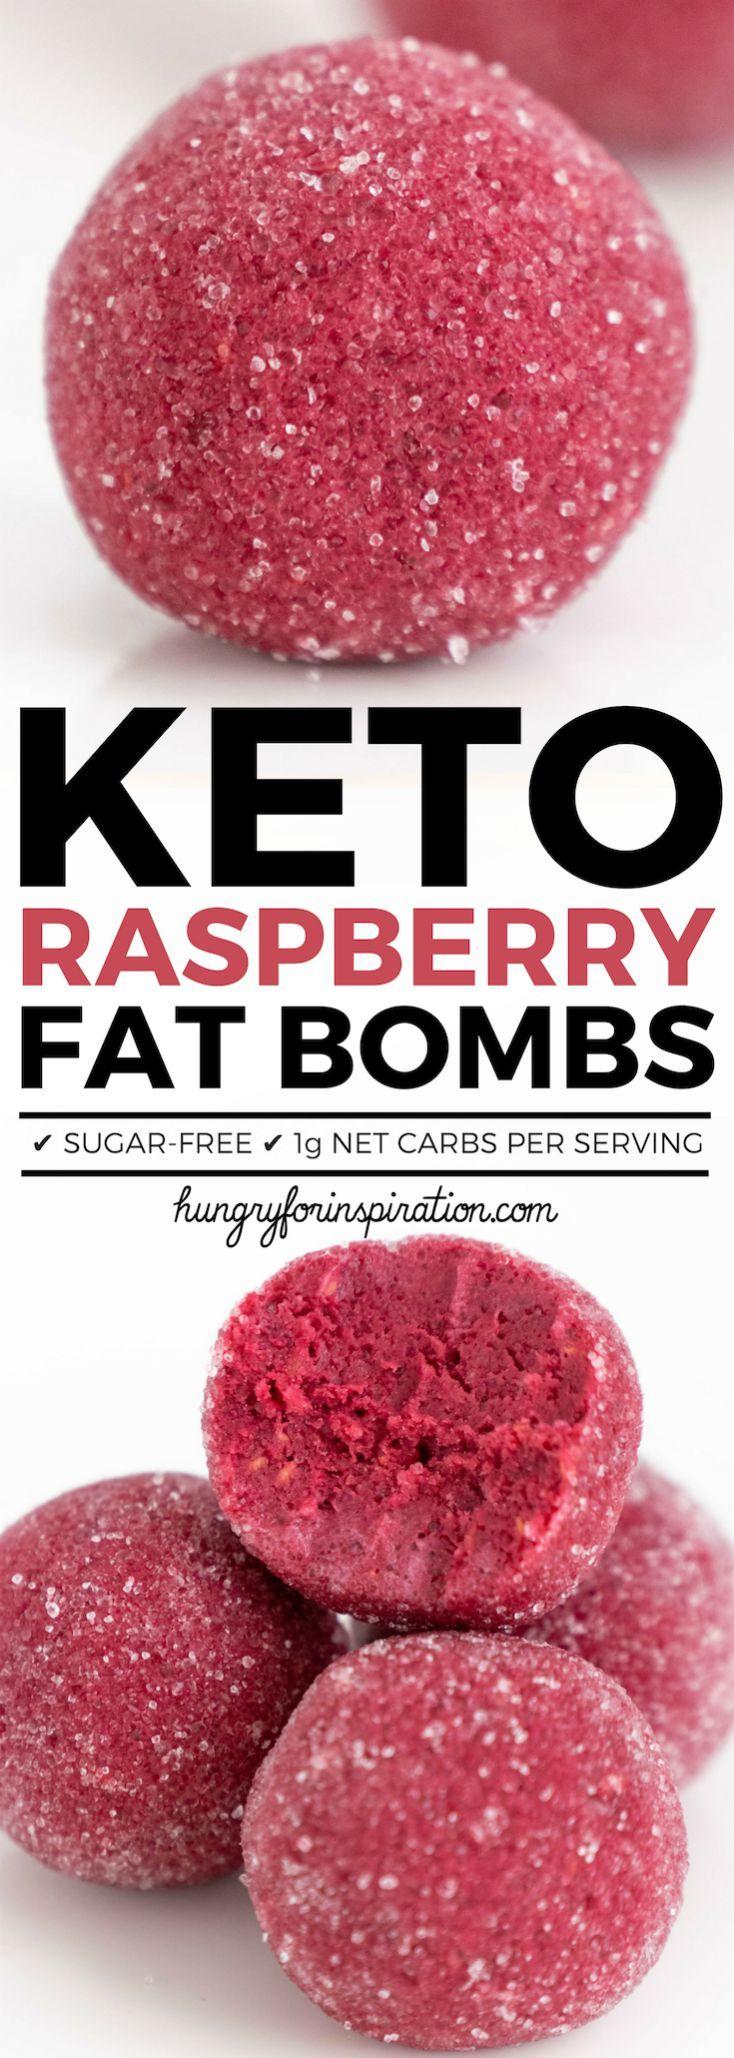 Healthy Raspberry Keto Fat Bombs (Easy Keto Snacks Or Keto Dessert) #ketodesserts